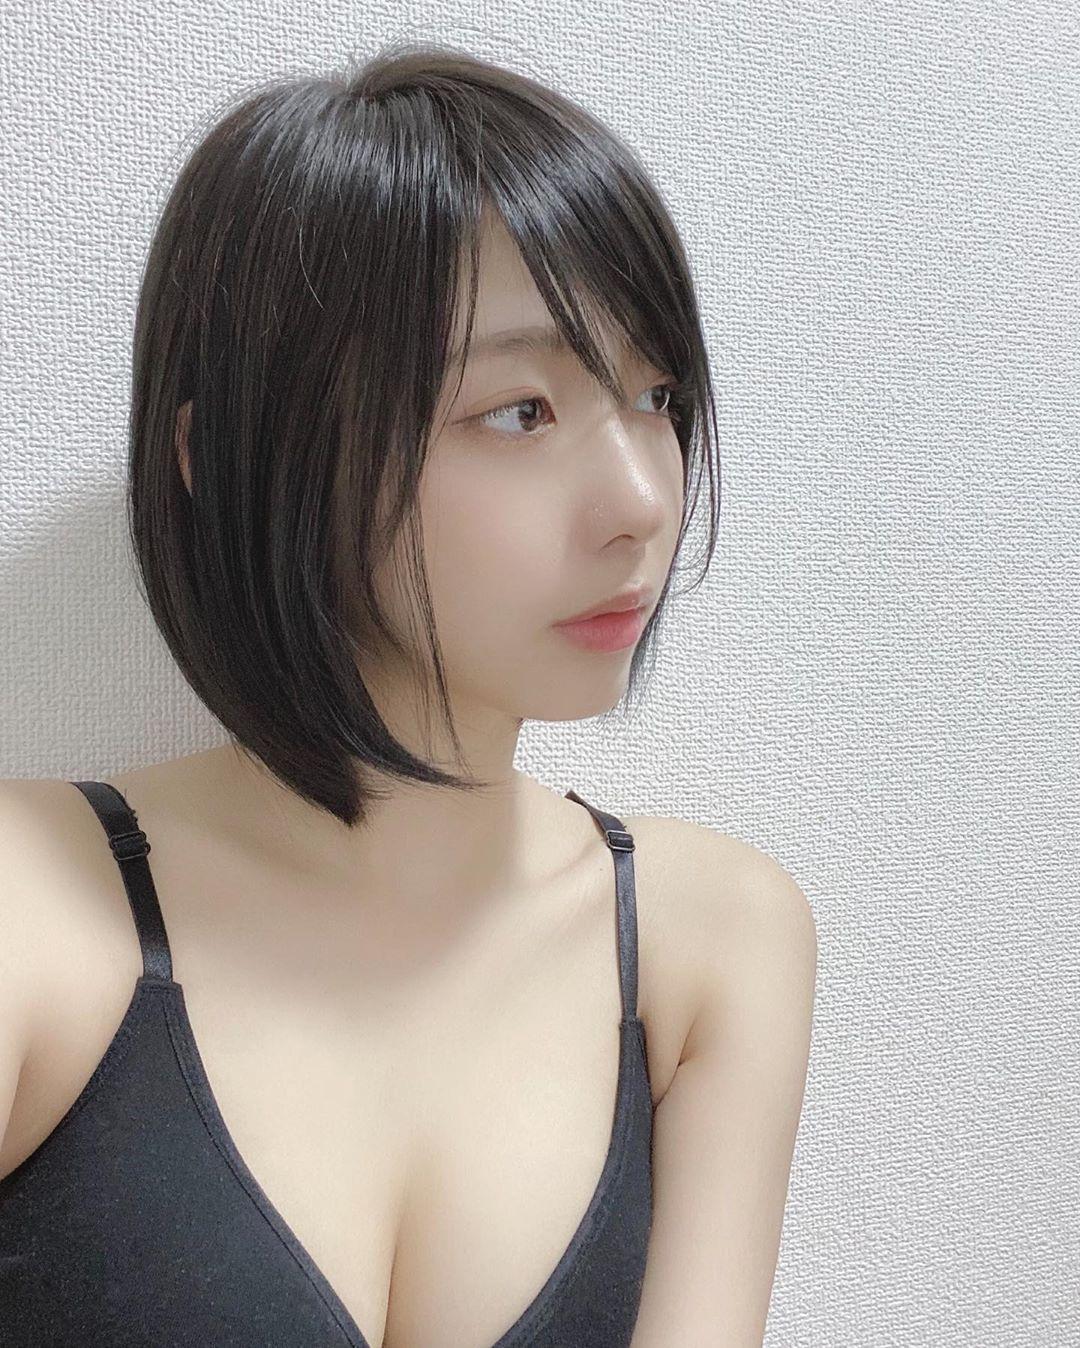 NnzkVNfJ o - IG正妹—水湊みお Mio Minato